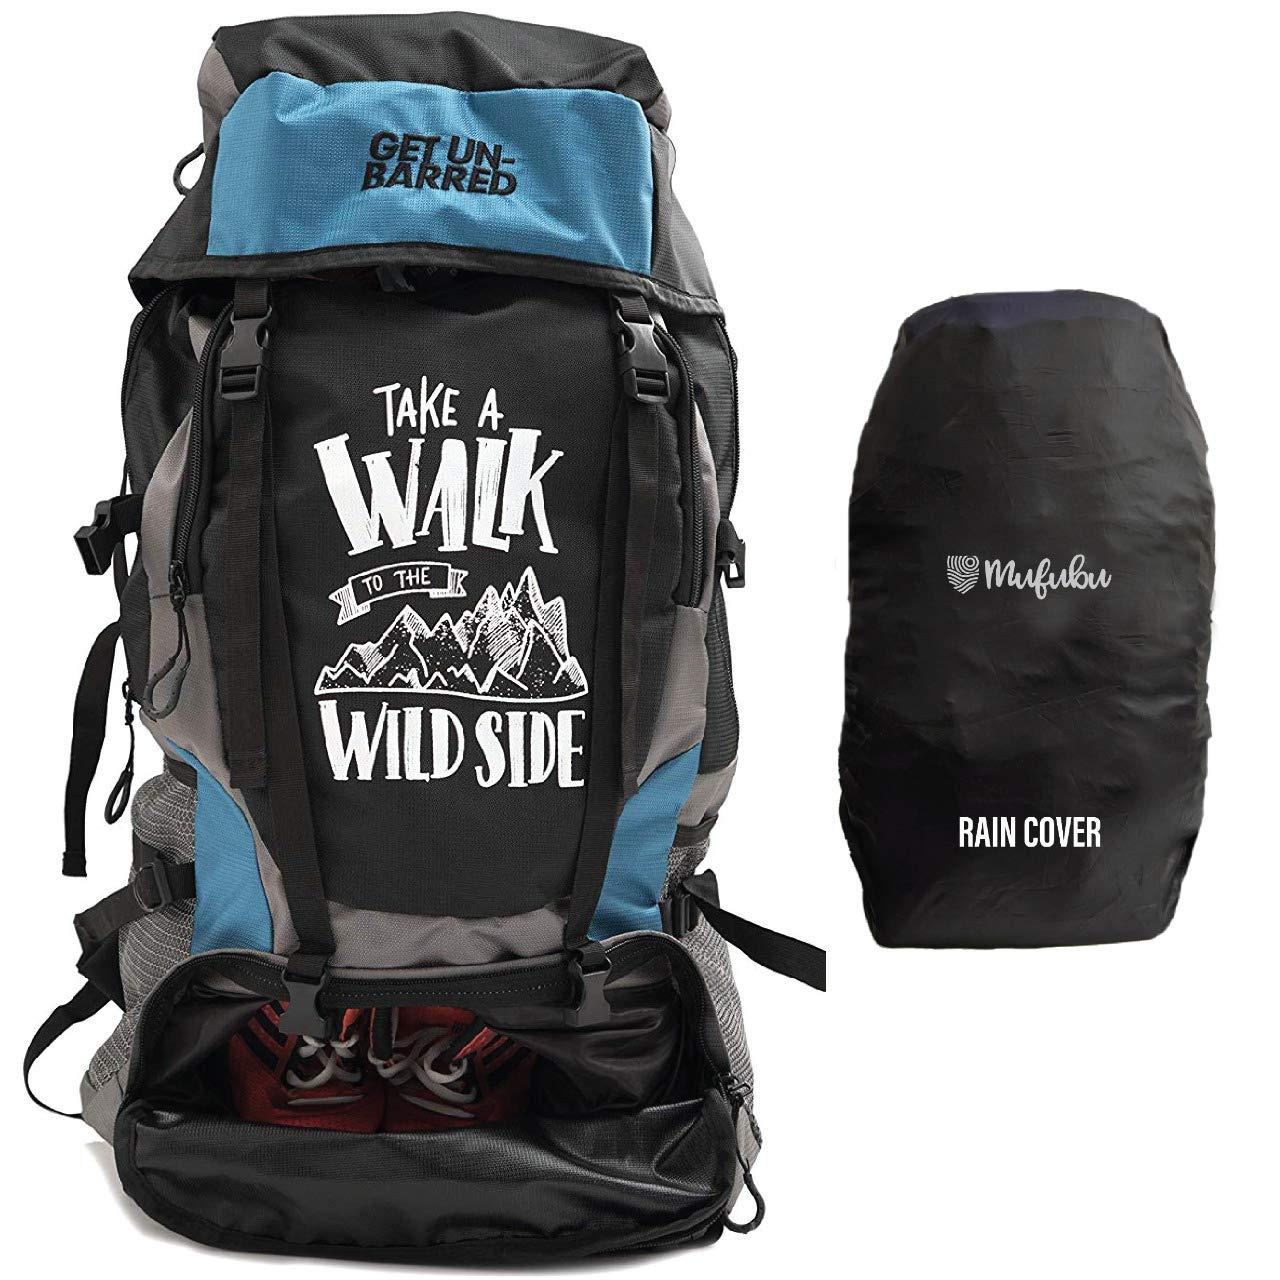 Best rucksack Brand in India 2021